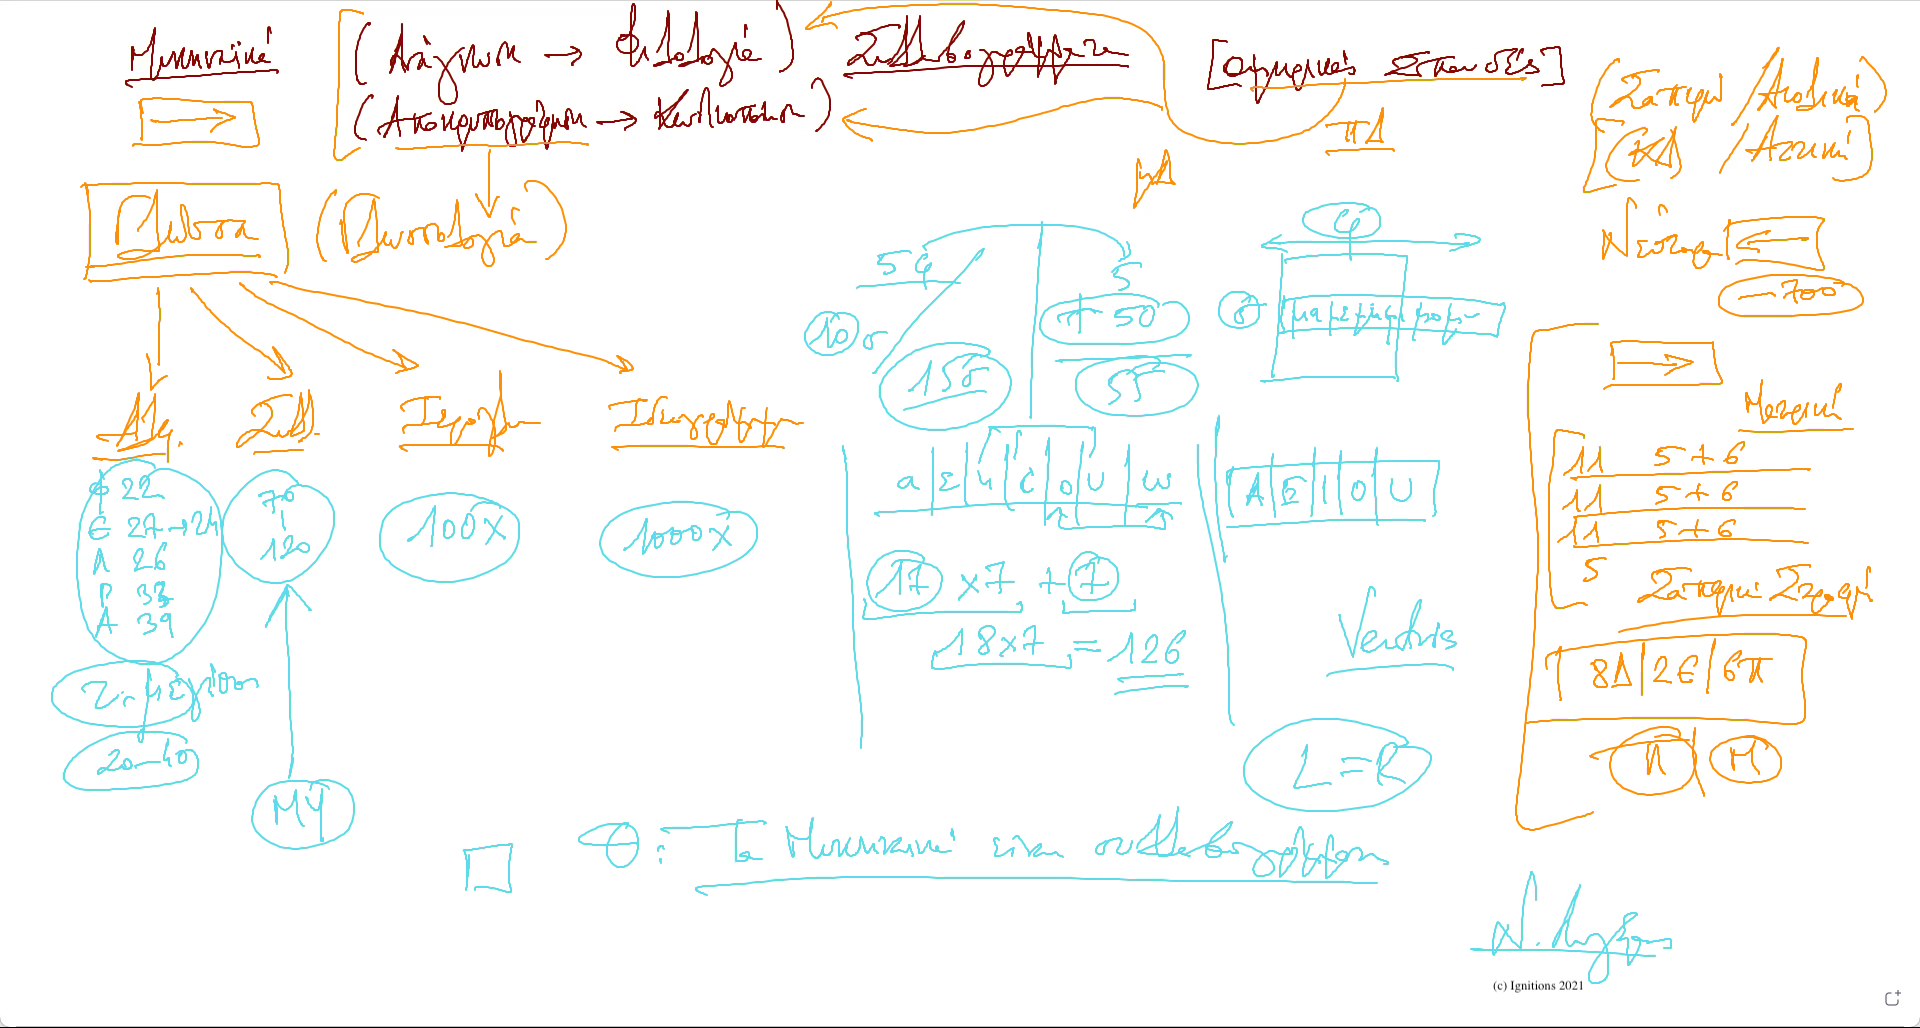 58526 - e-Μάθημα Ι: Μυκηναϊκά και αποκρυπτογράφηση. (Dessin)